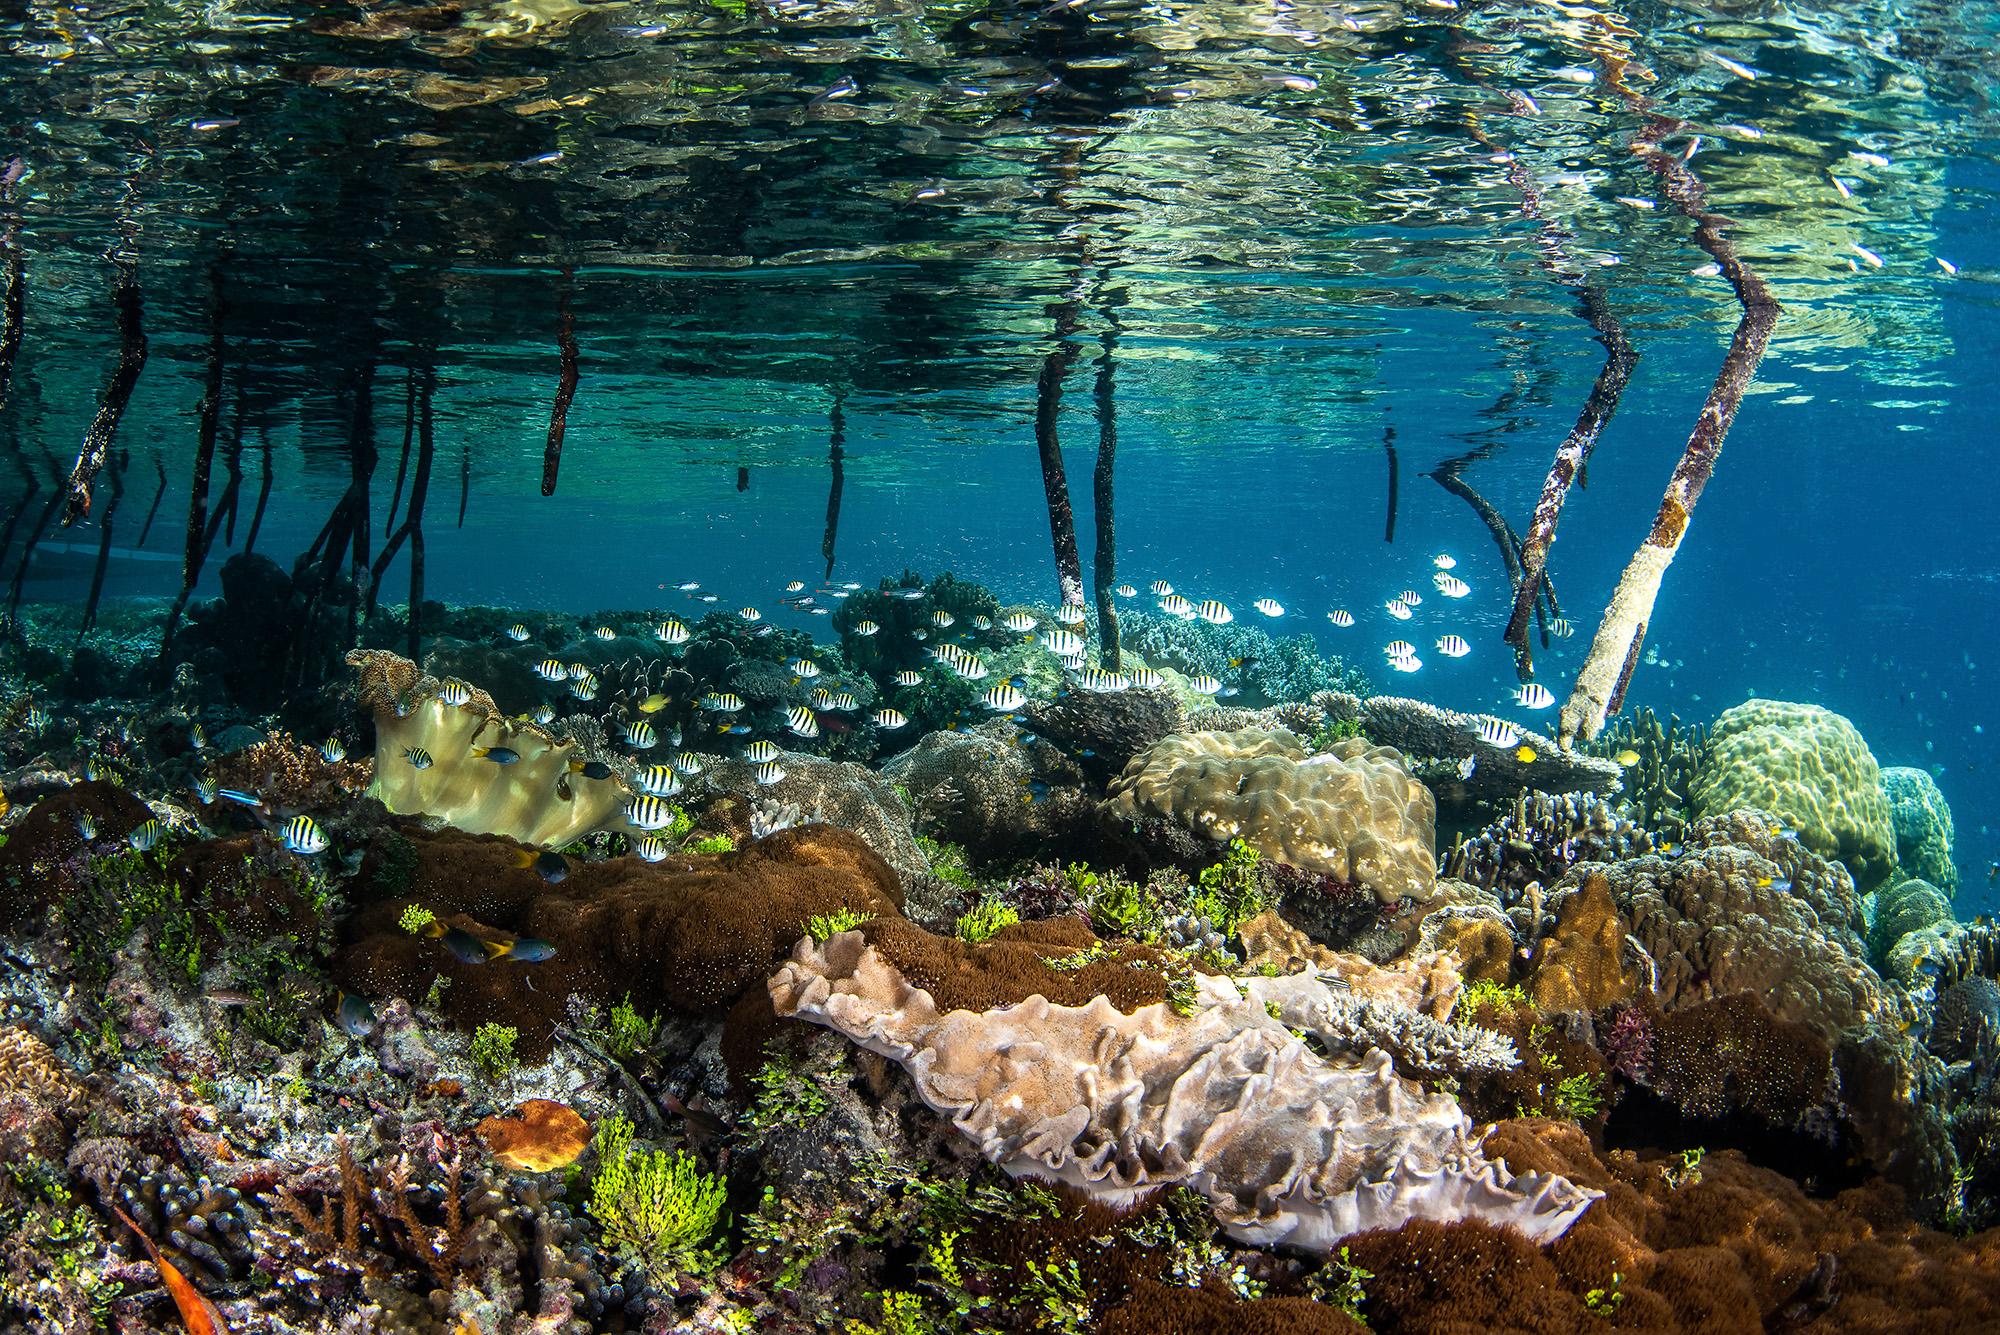 coral reef, mangrove, the ocean agency, Indonesia, Photo Credit: Brook Peterson / The Ocean Agency